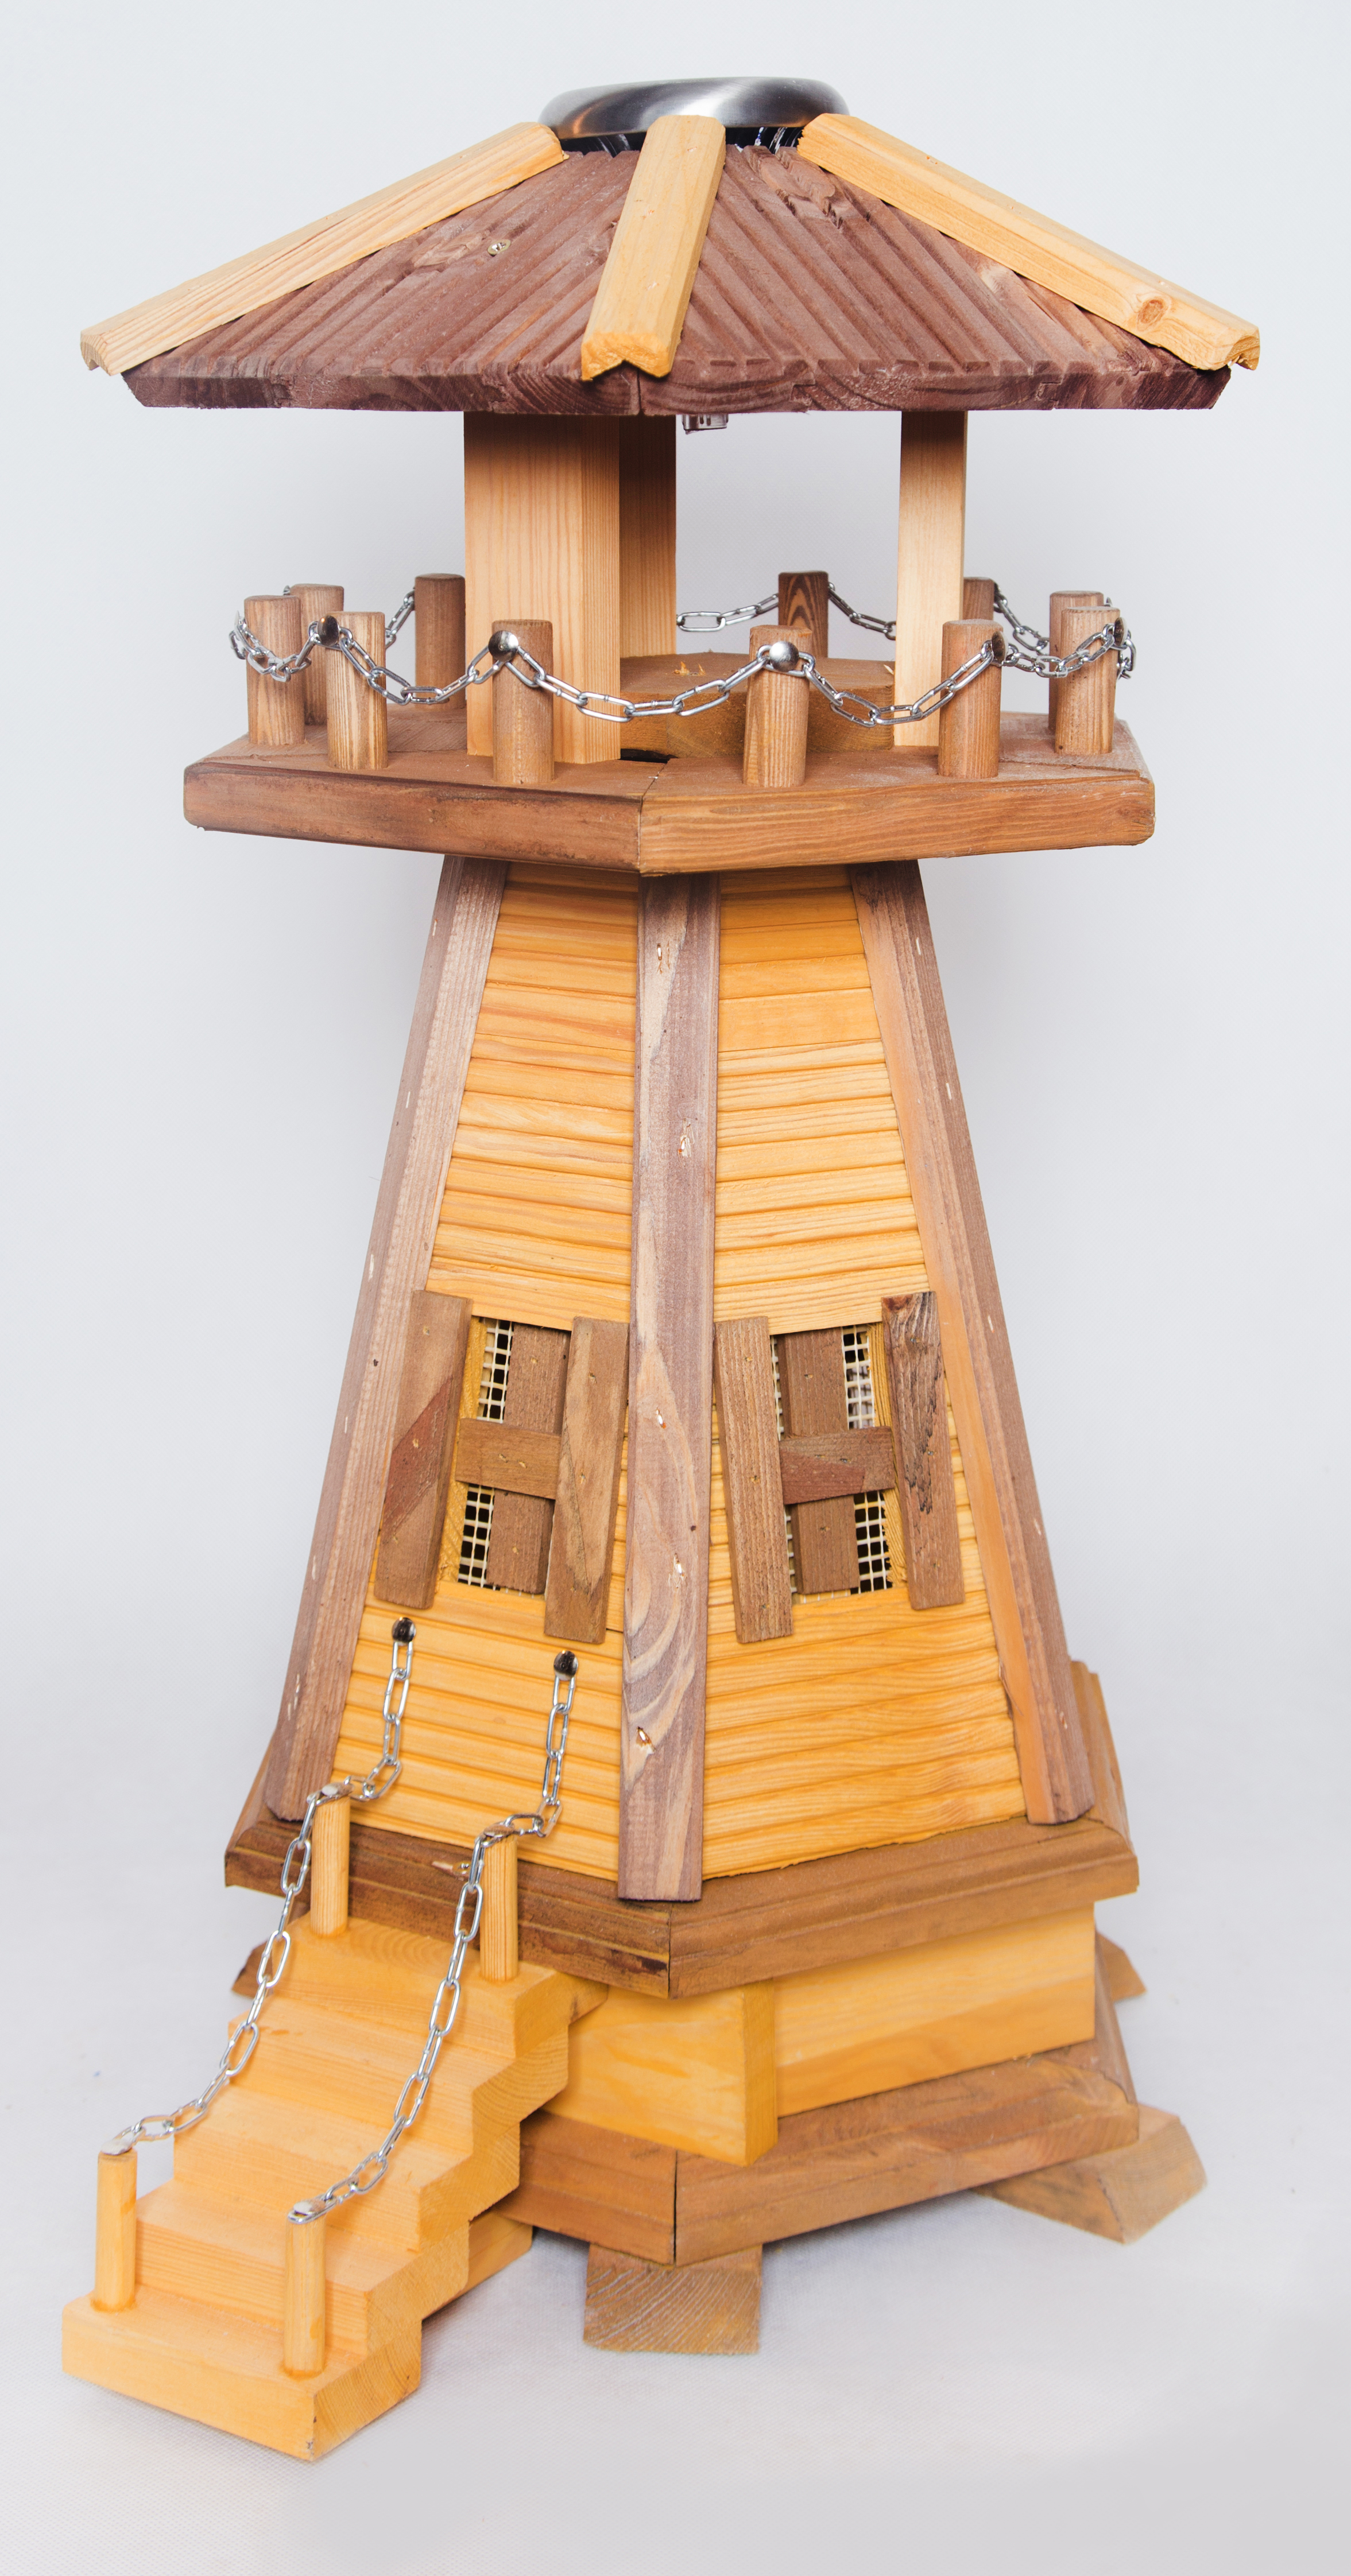 kleine leuchtturm aus holz masuren souvenir. Black Bedroom Furniture Sets. Home Design Ideas